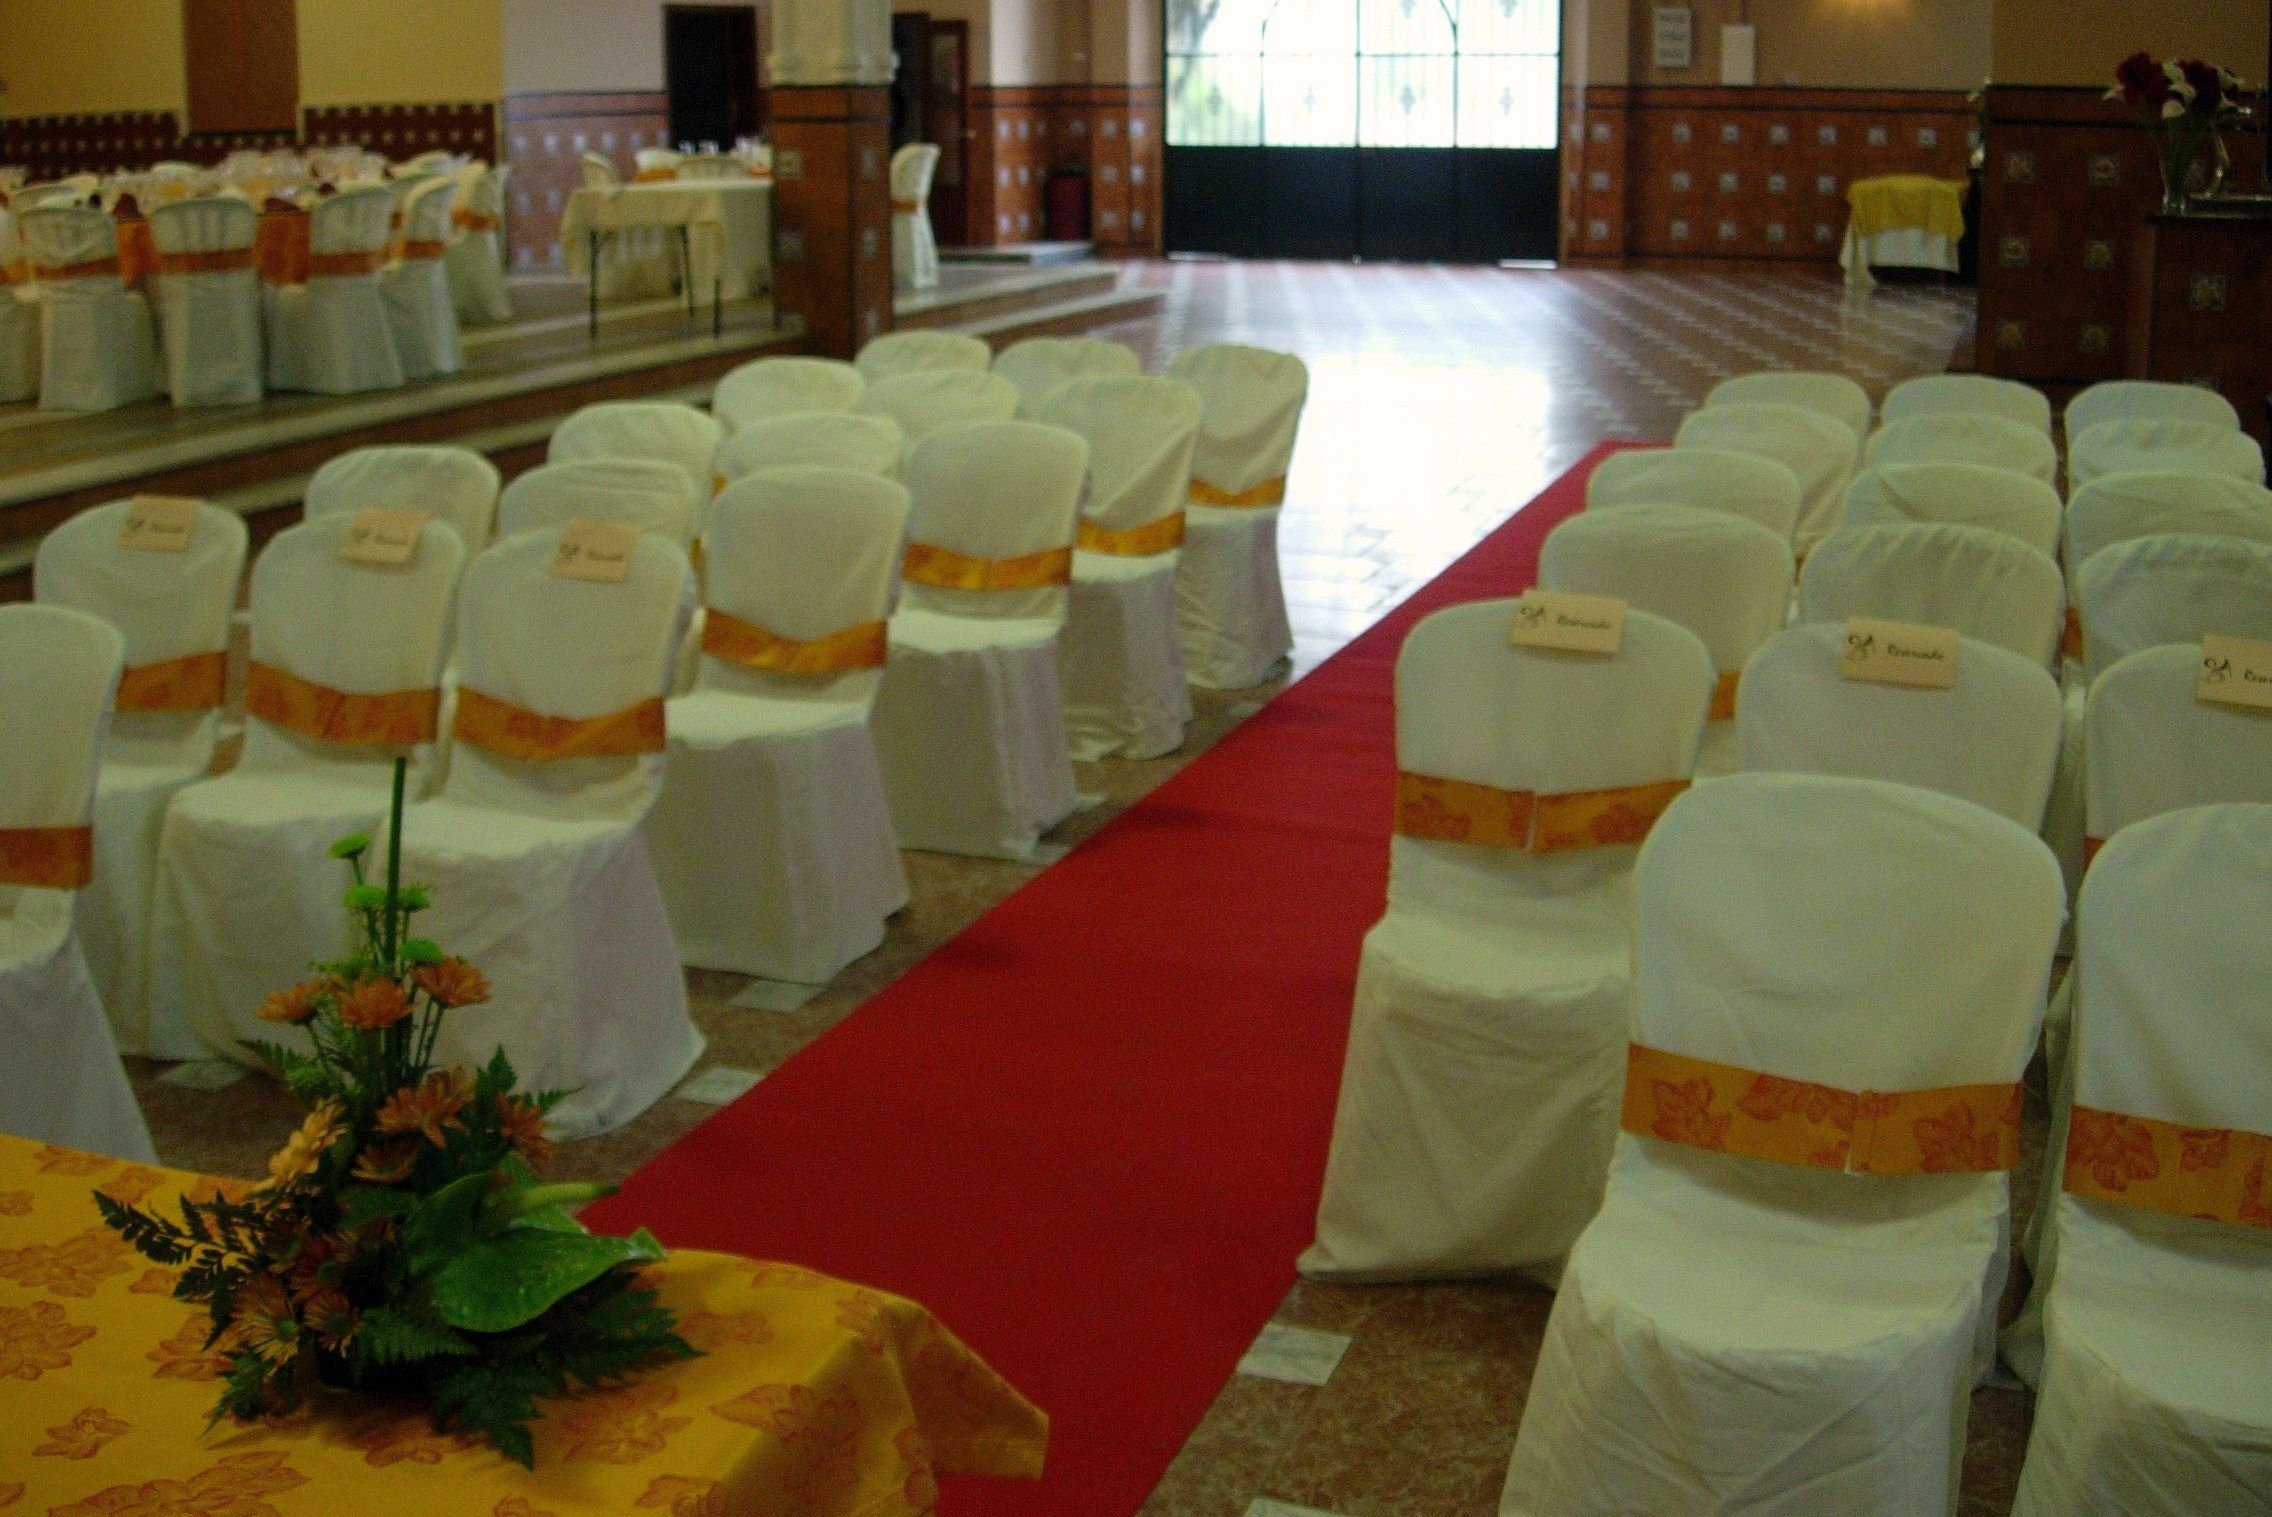 Sal n de celebraciones villa araceli for Acuario salon de celebraciones